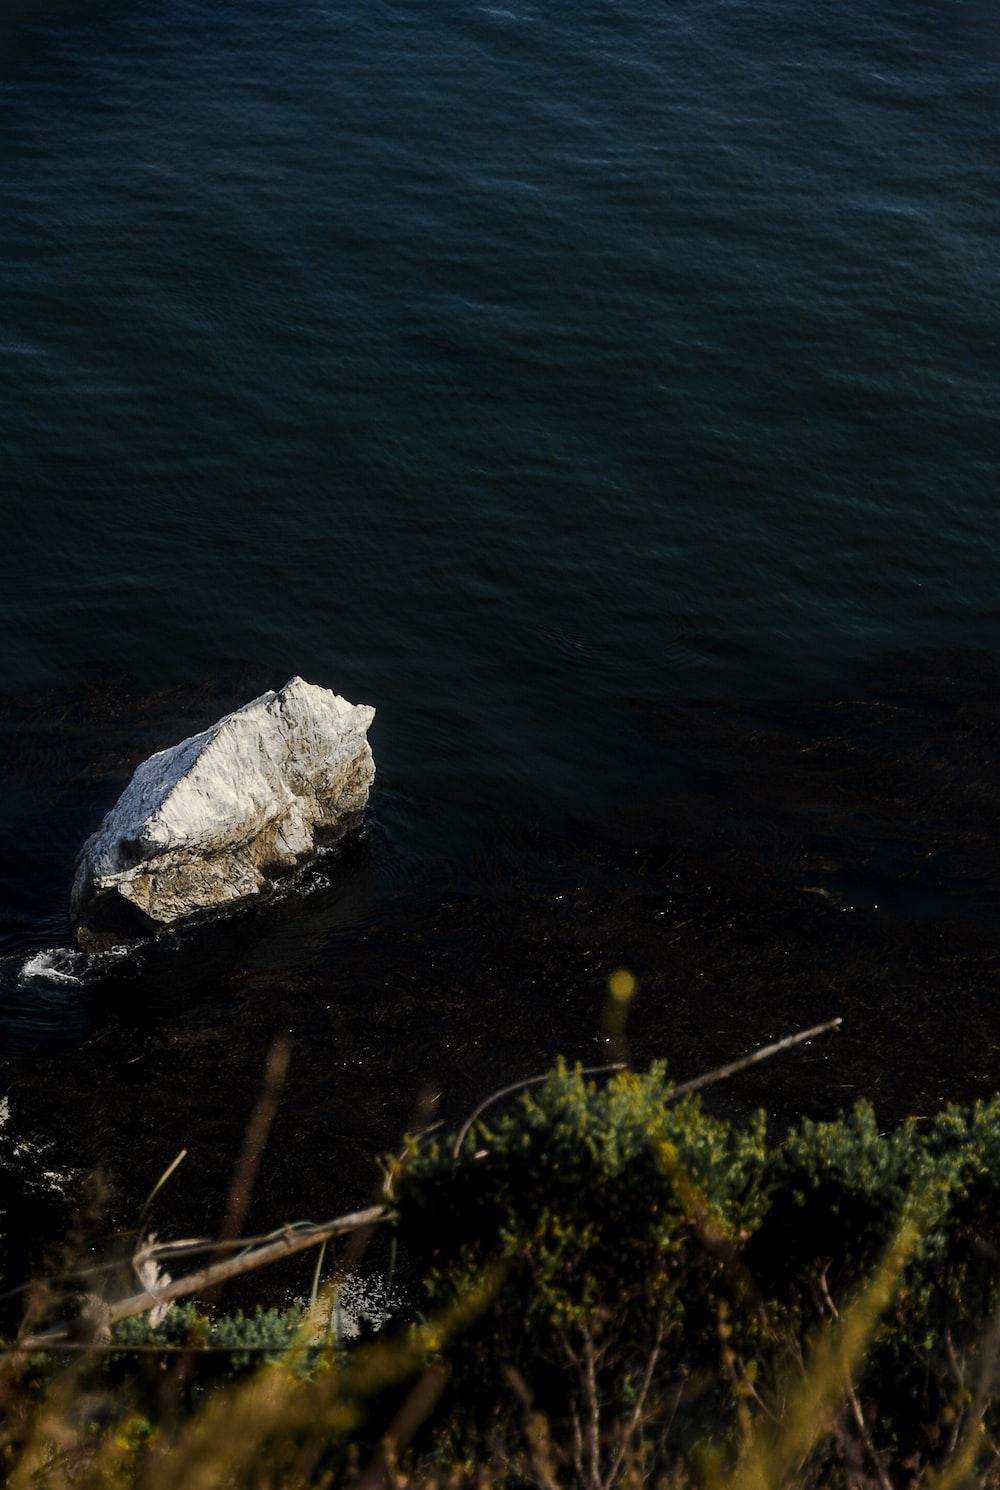 grey rock on water